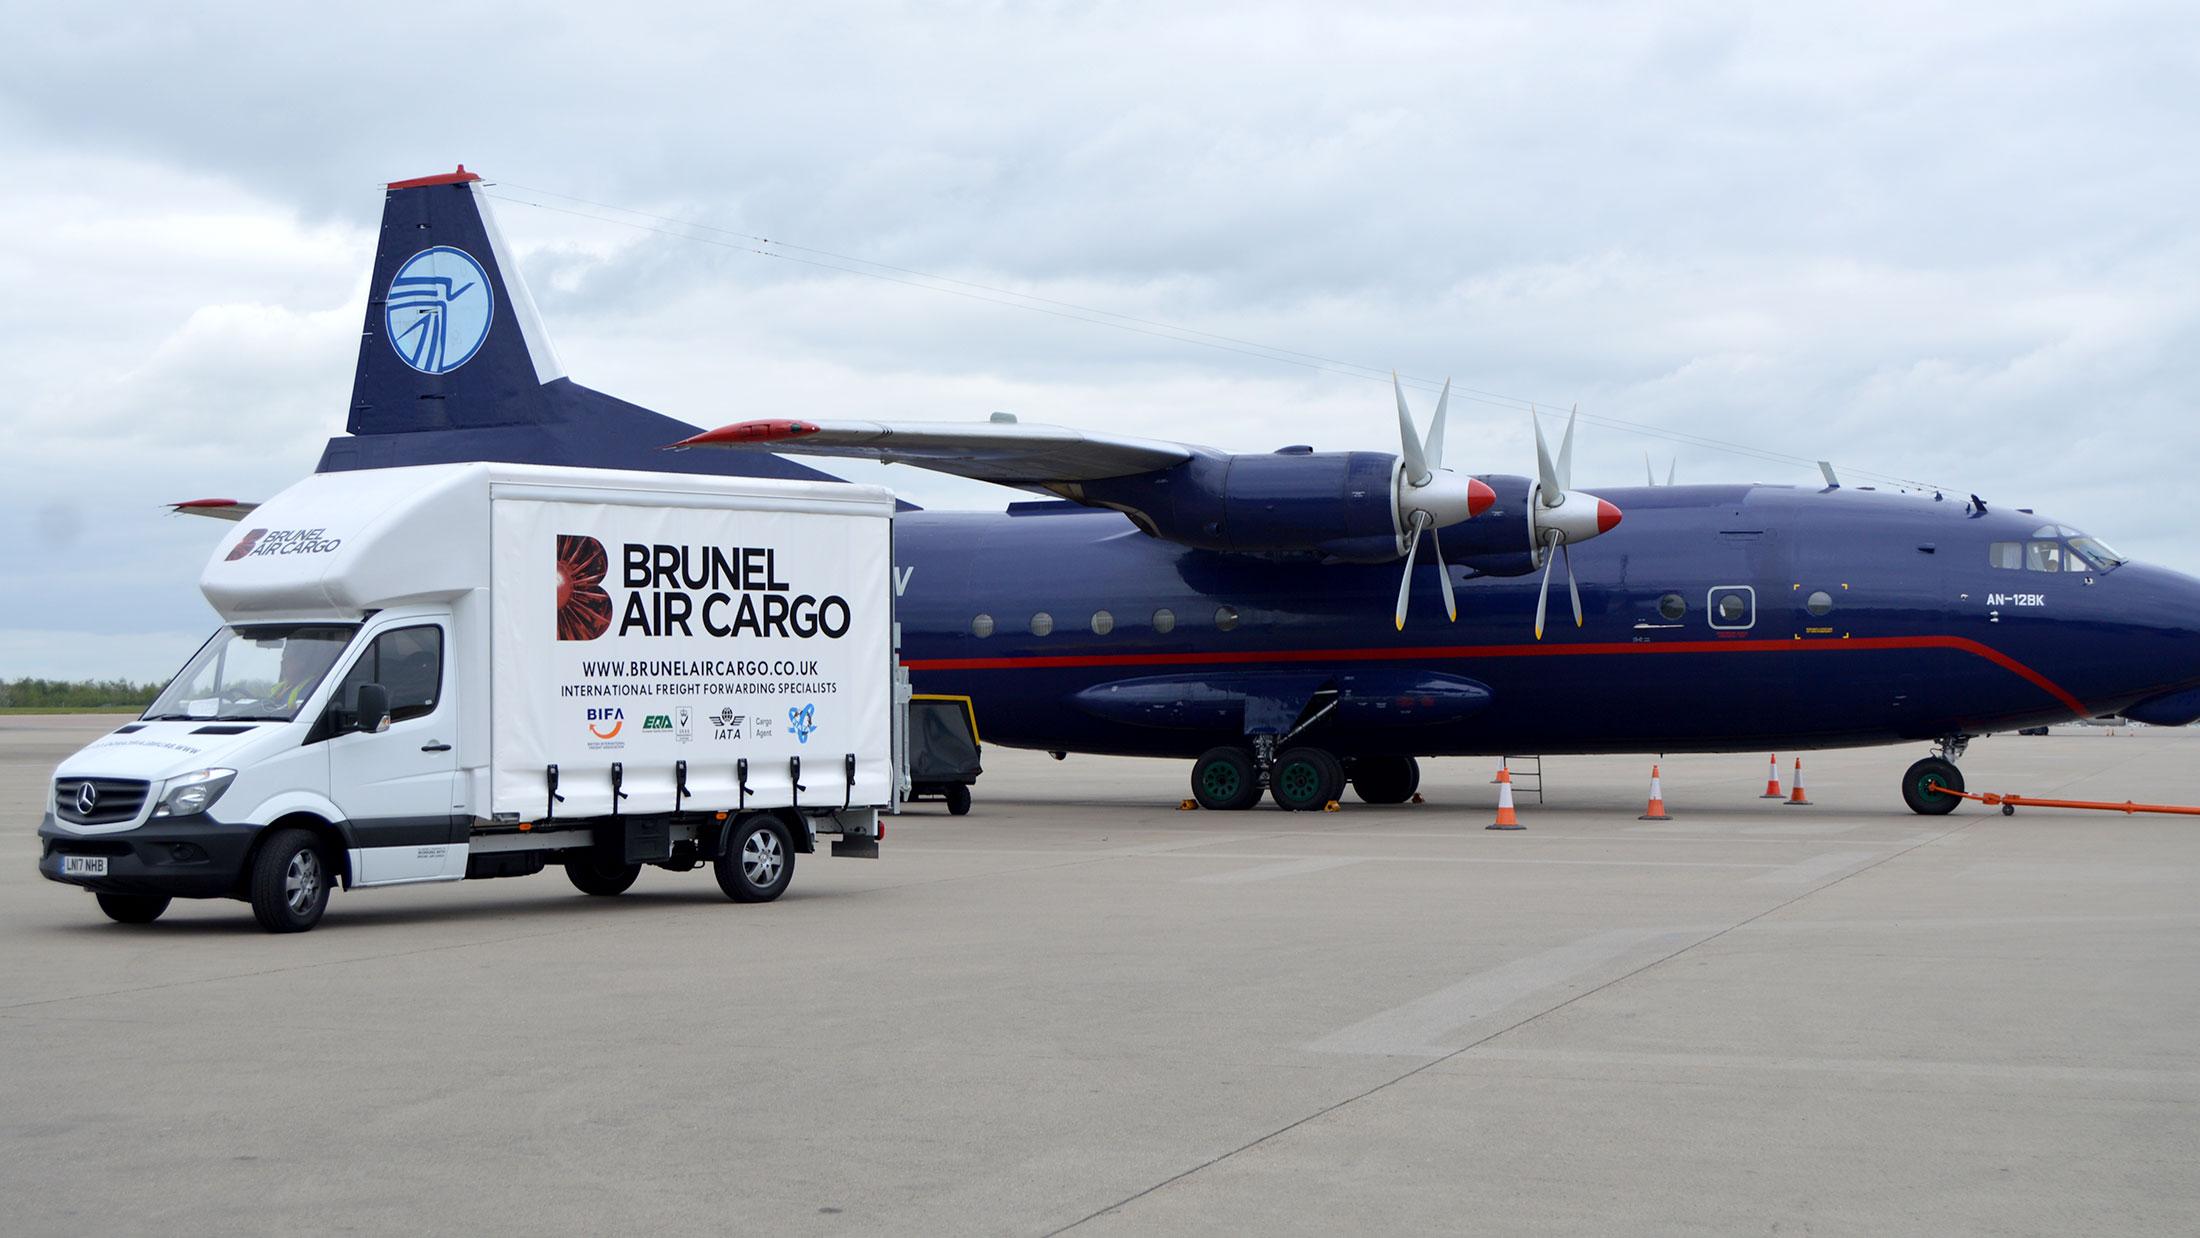 Brunel Air Cargo Services Ltd - Brunel Air Cargo